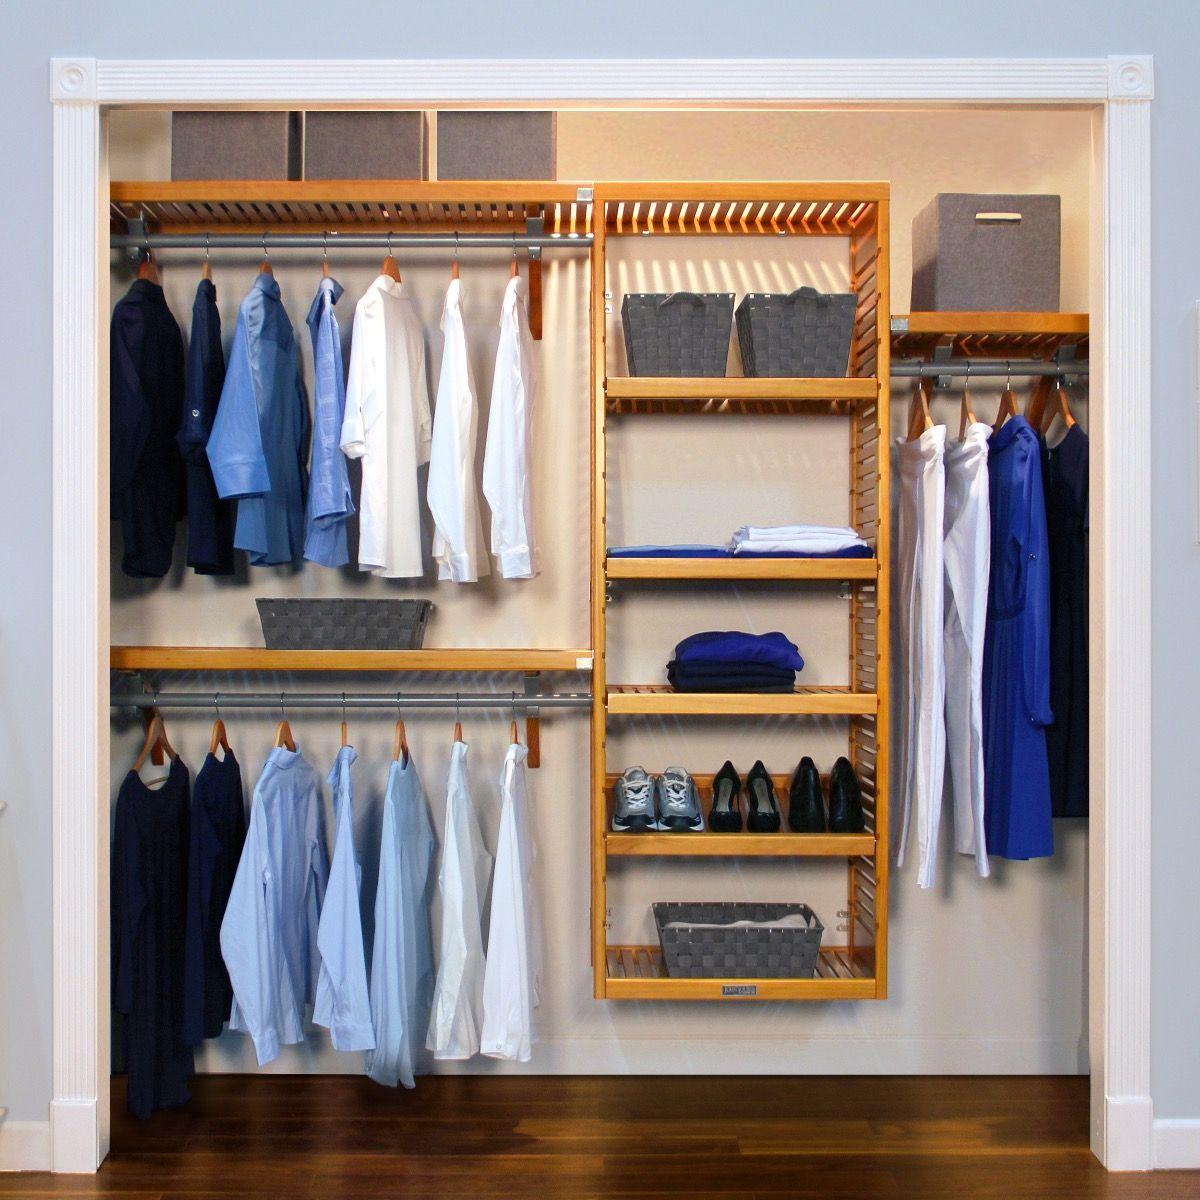 Closet Organizer Kit   16in. Deep Deluxe Wood Closet Organizer L John Louis  Home